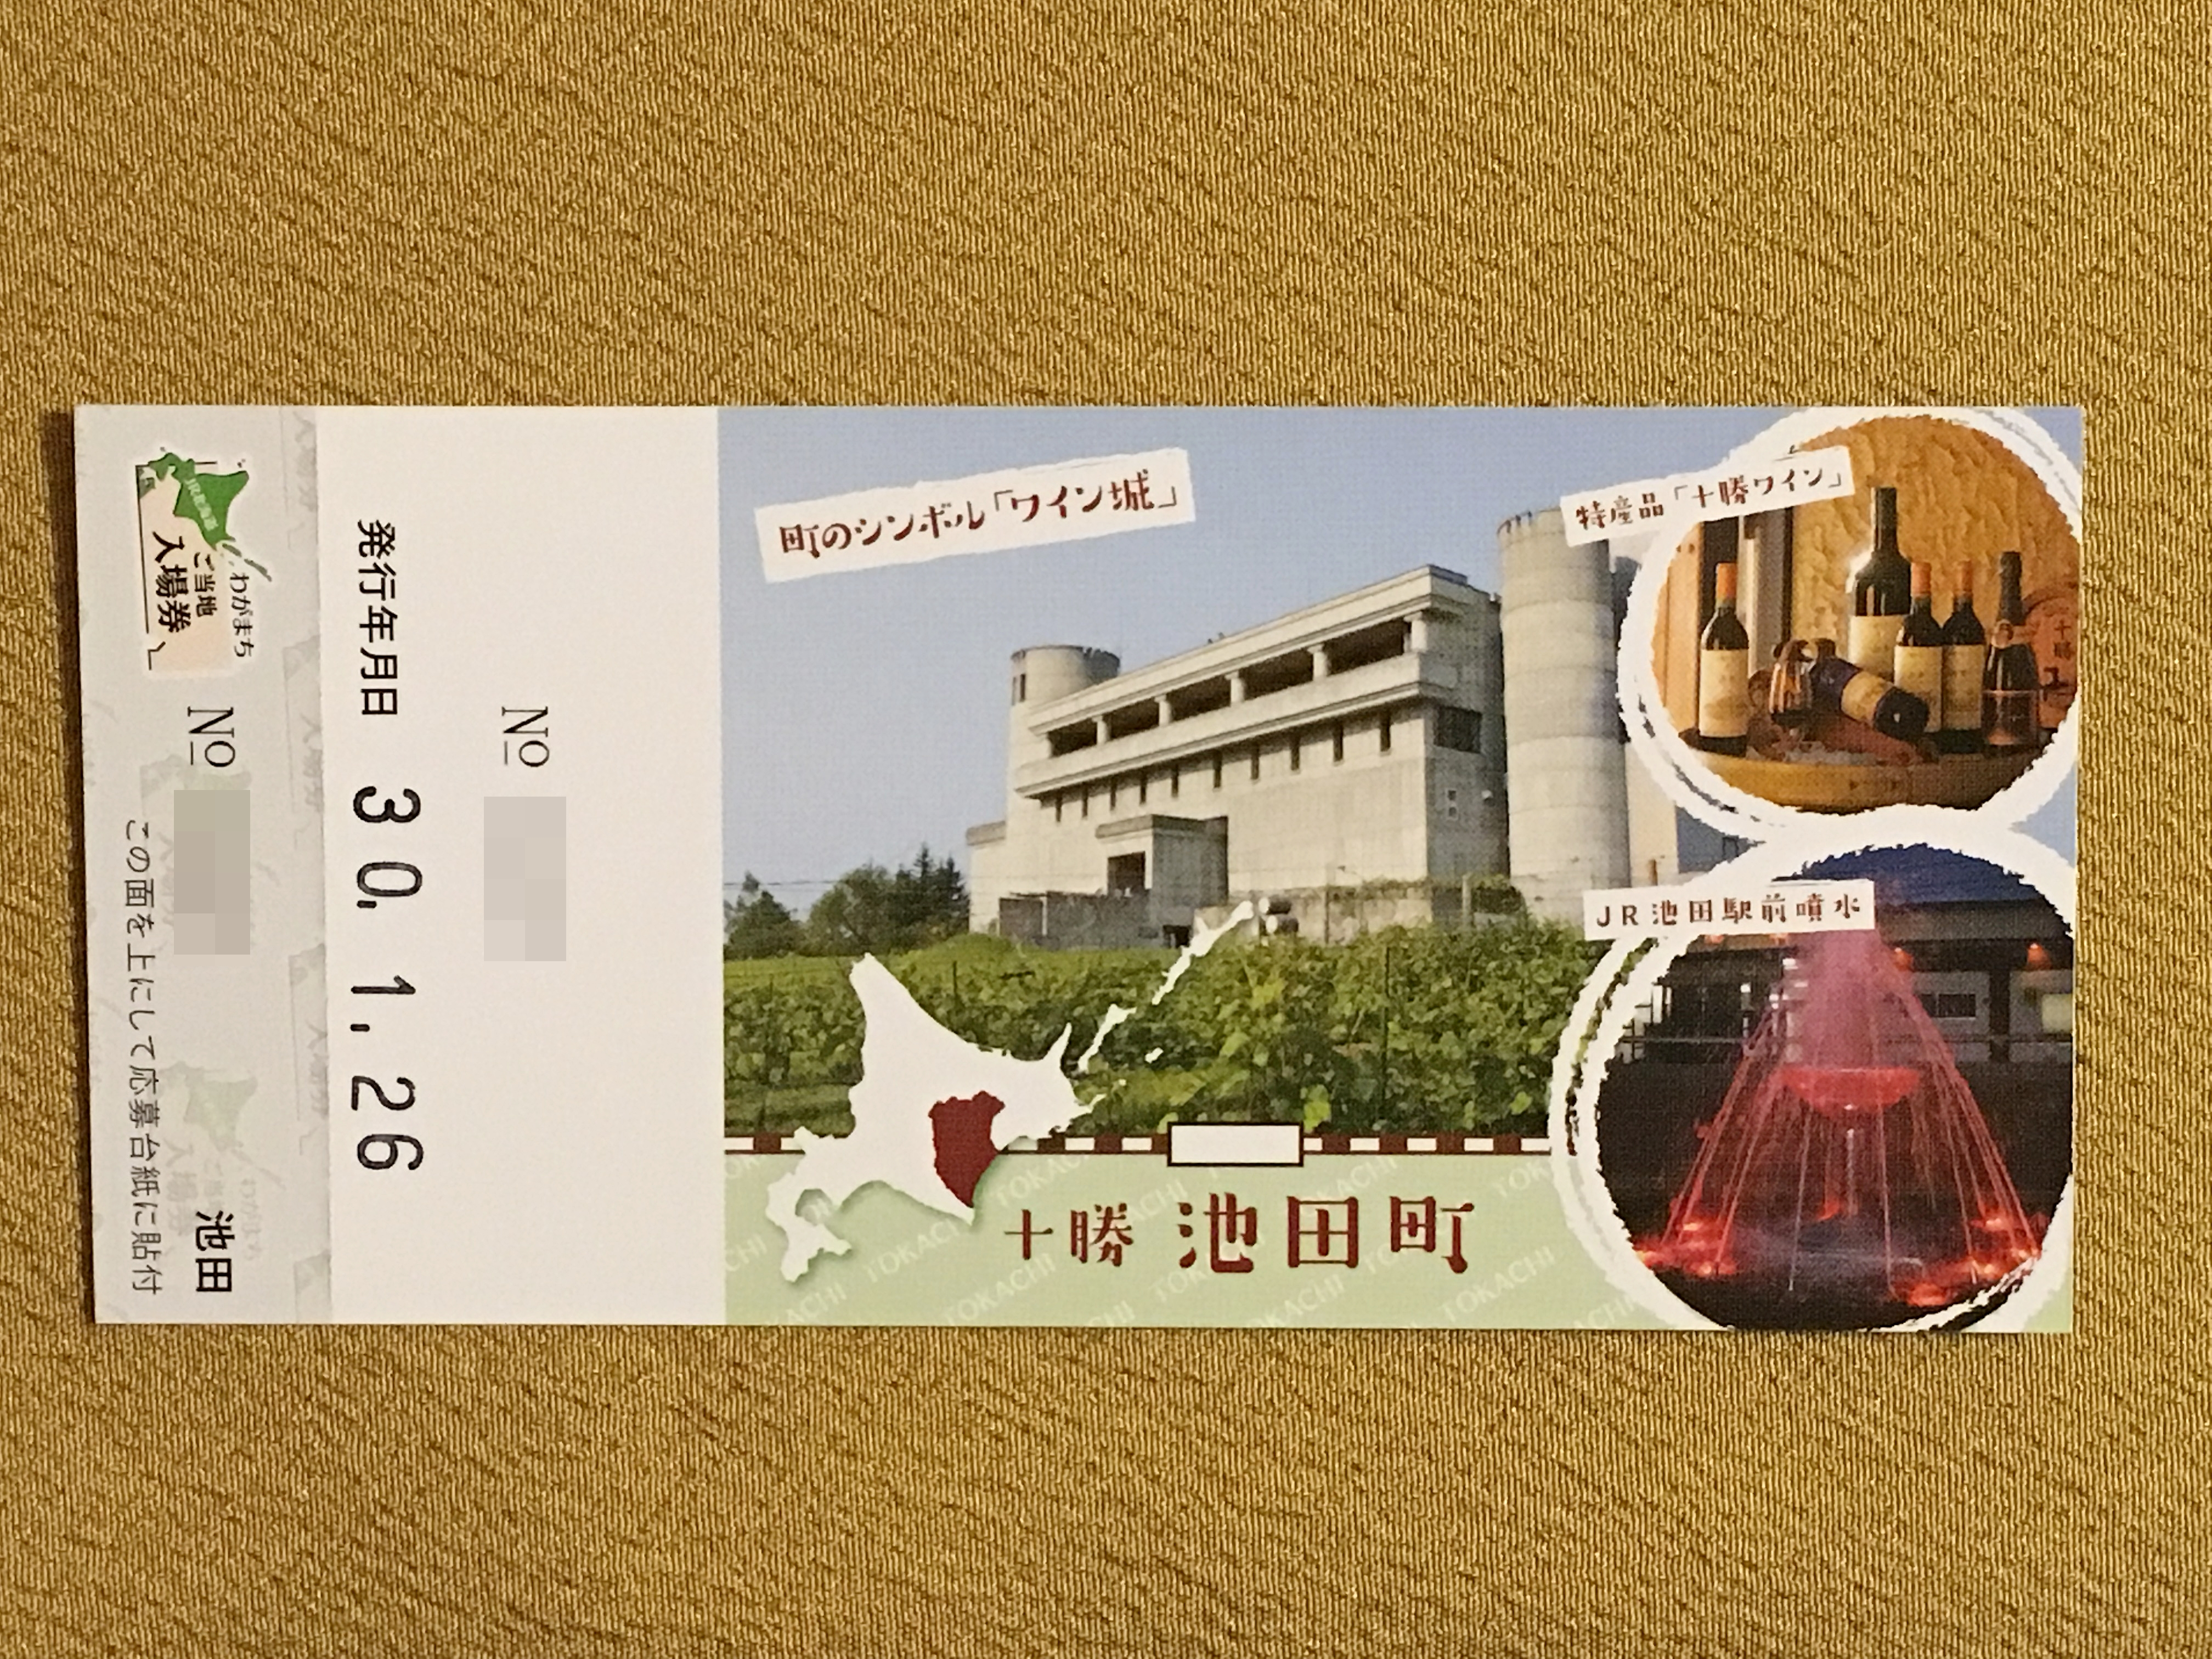 JR北海道ご当地入場券 池田駅裏.JPG